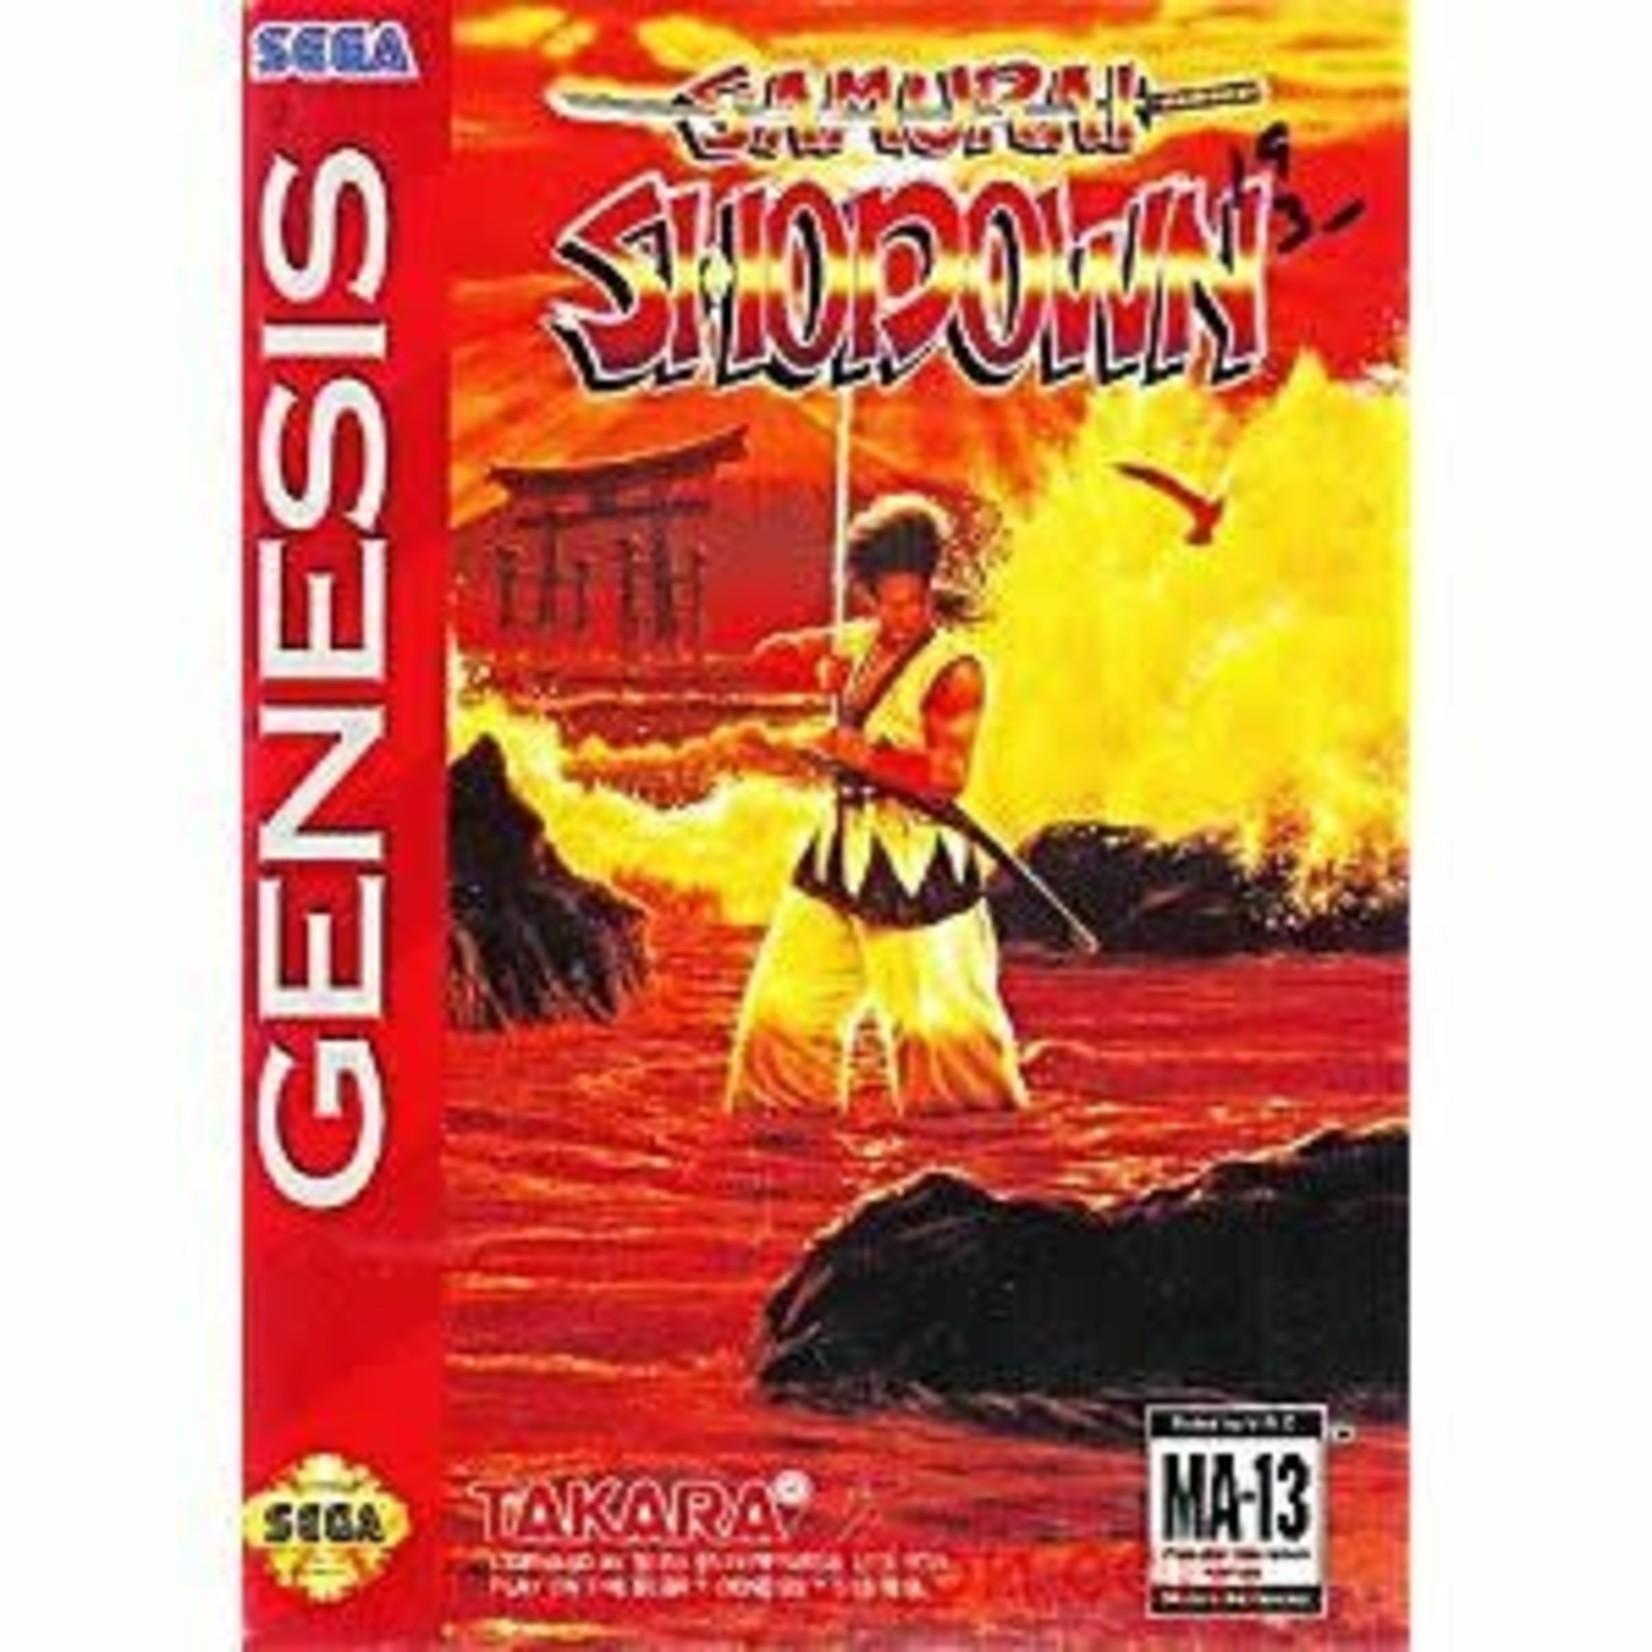 sgu-samurai shodown (cartridge)